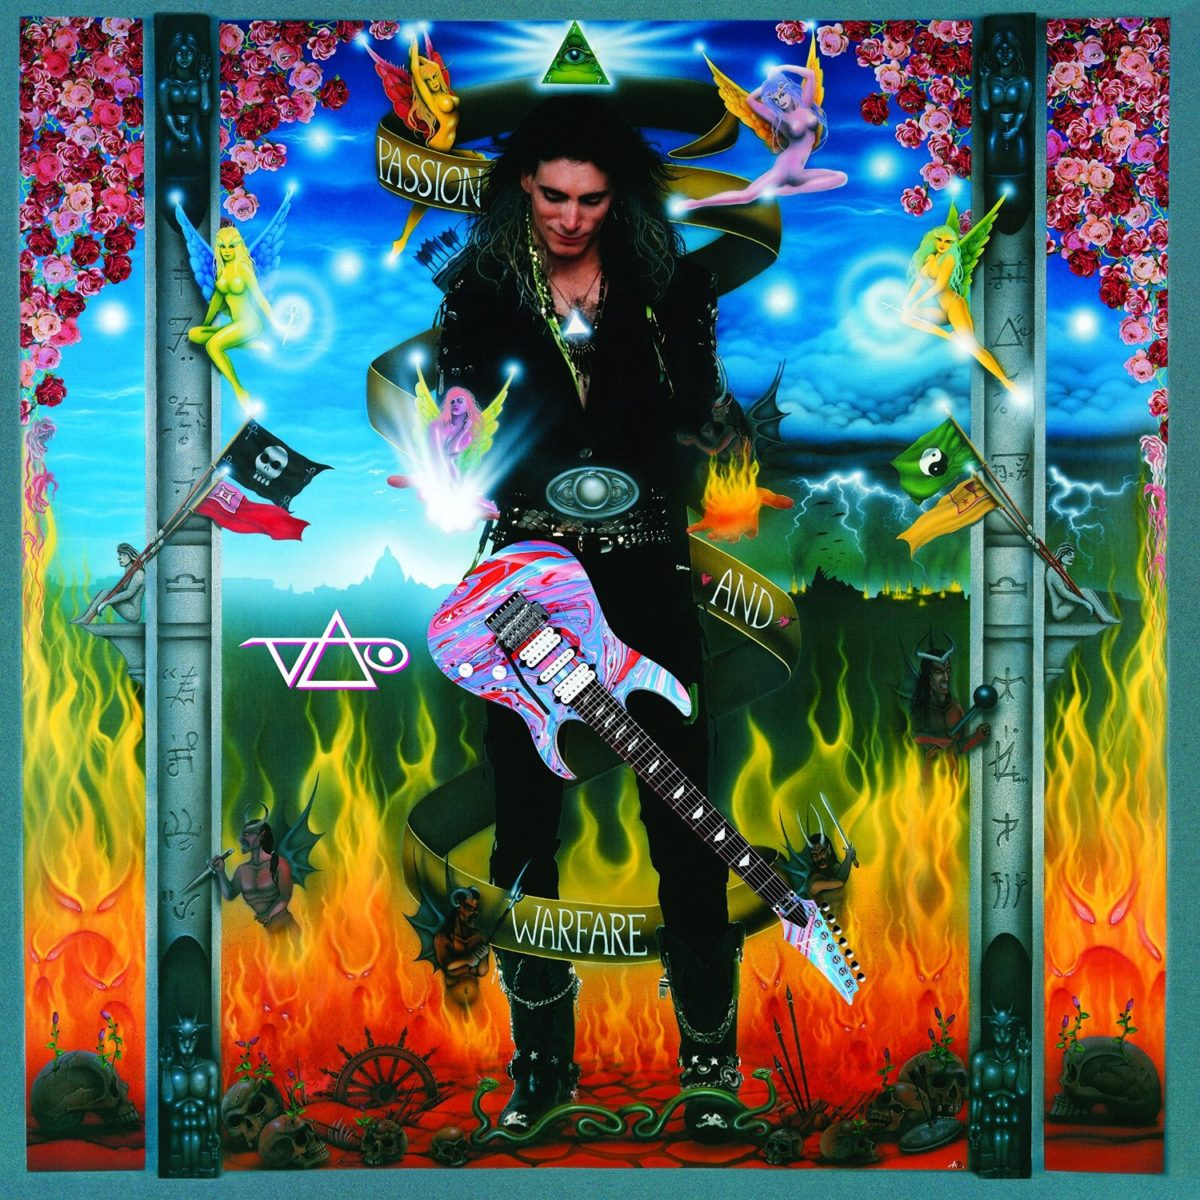 stevevai.it - Steve Vai - Passion and Warfare 25th